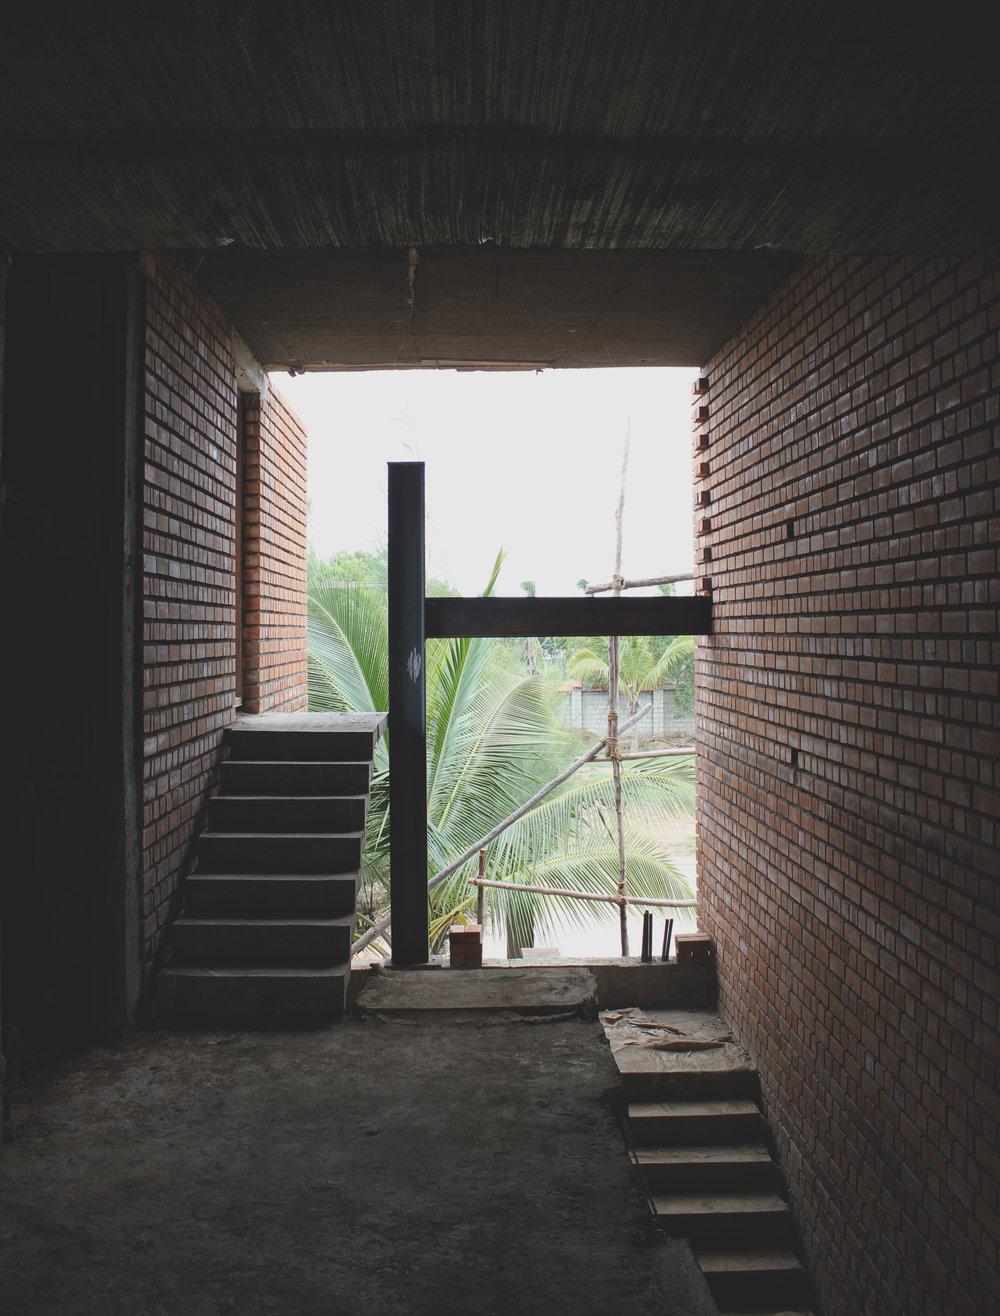 House Jade_Under Construction, 2012